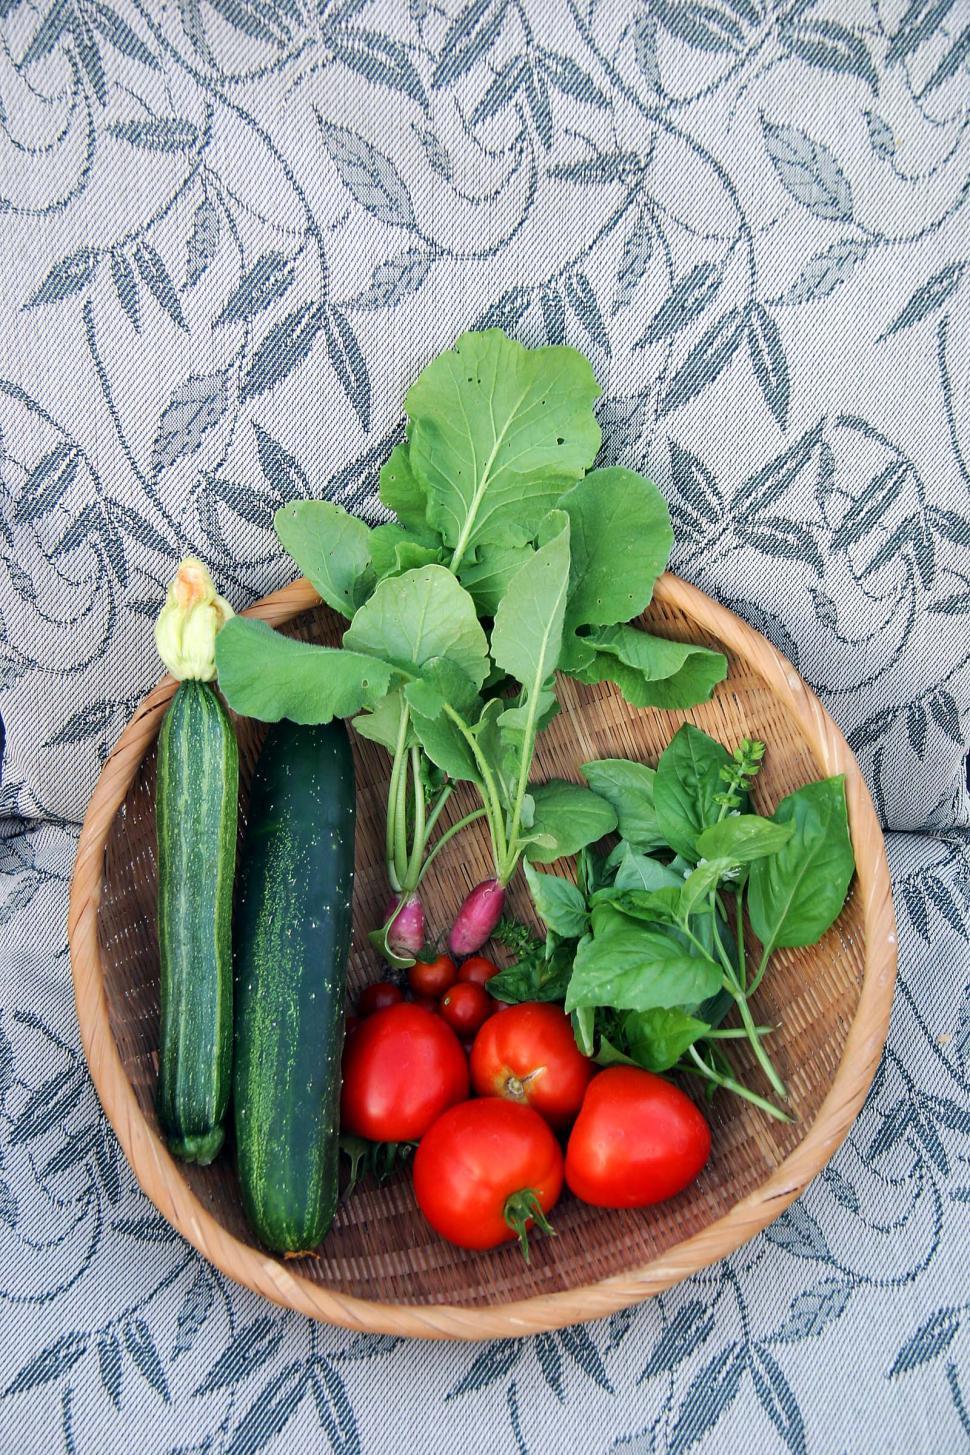 Download Free Stock HD Photo of Basket of veggies Online